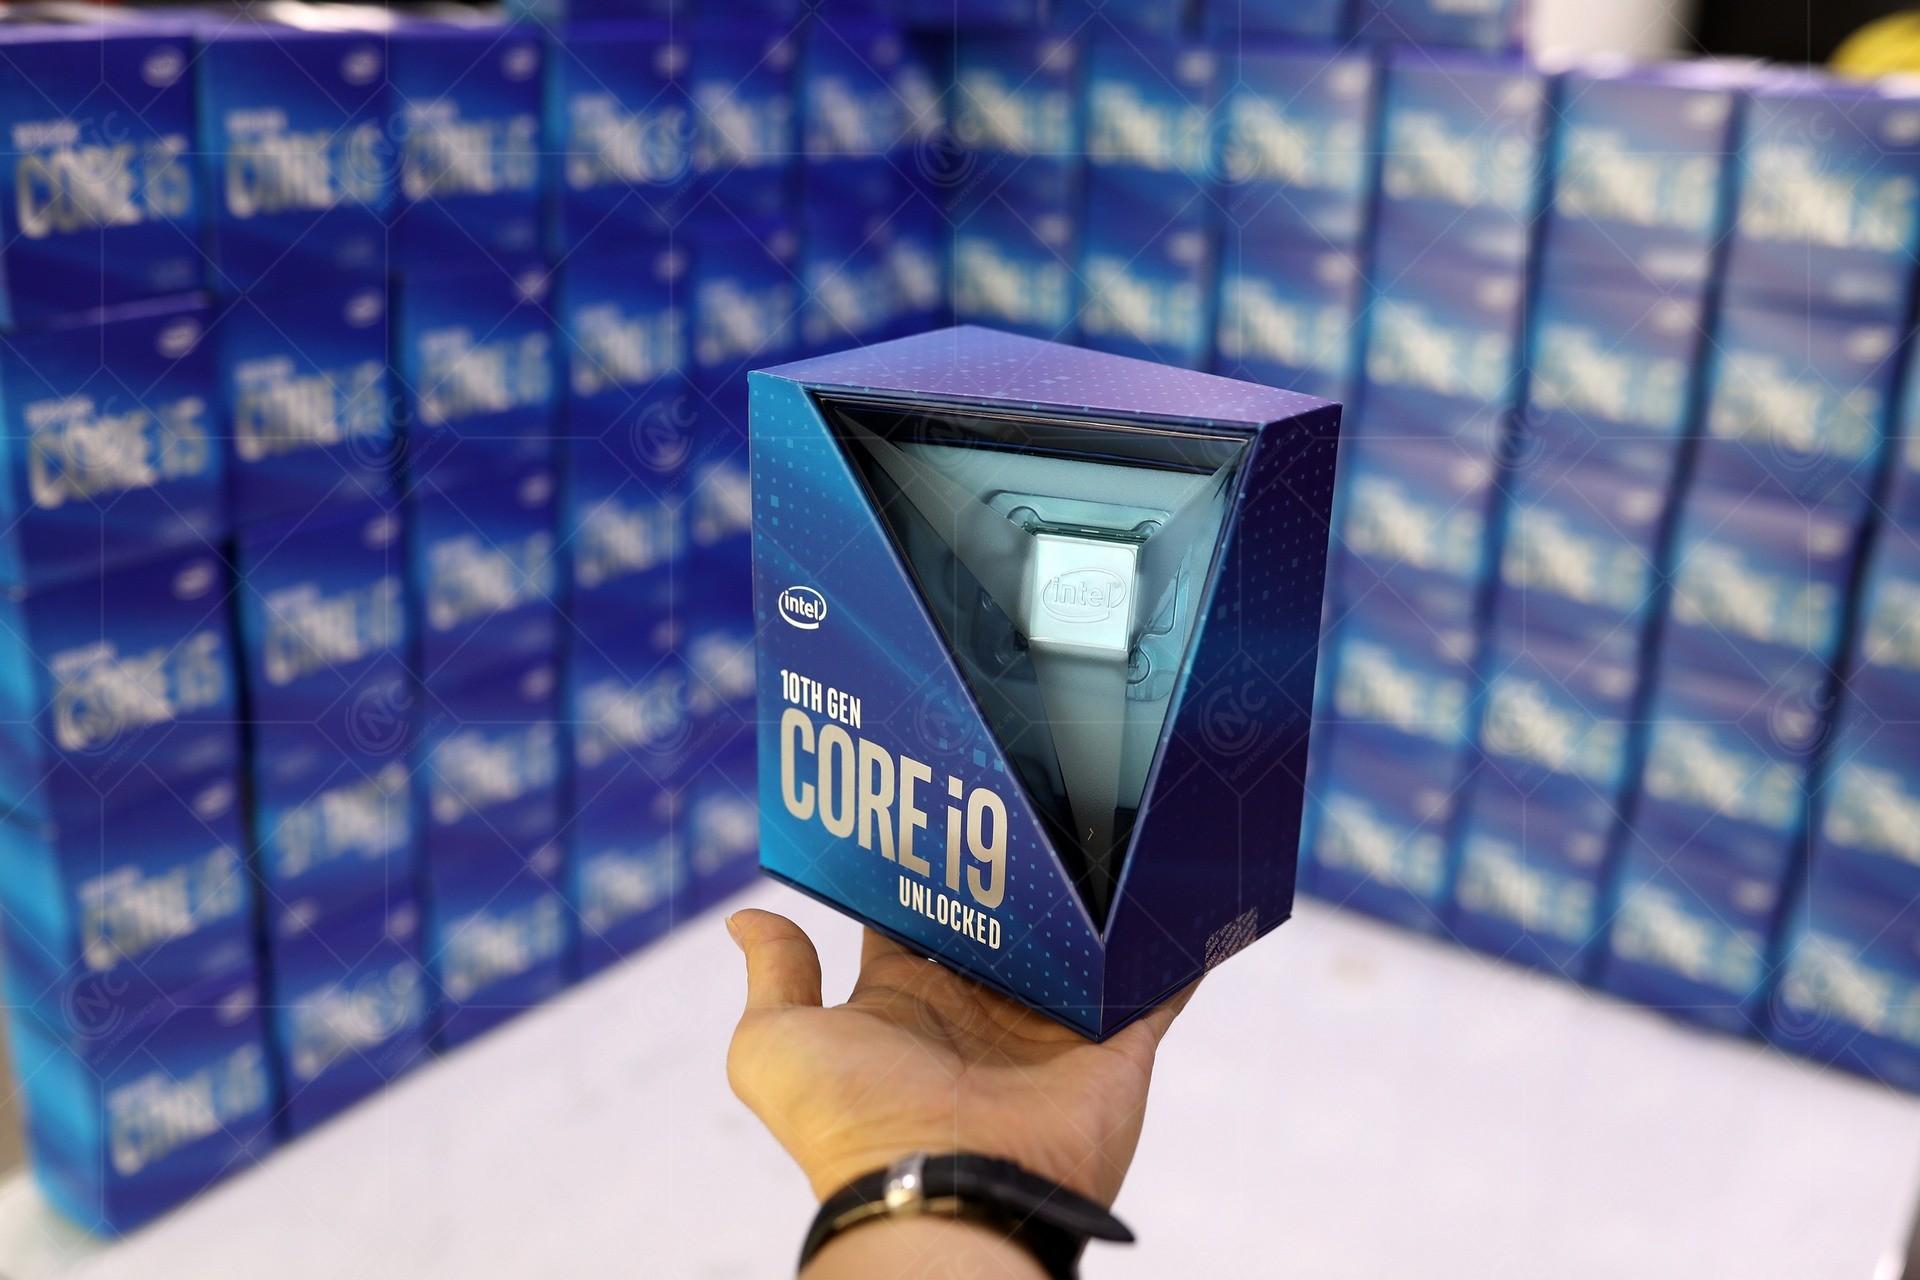 bo-may-tinh-pc-intel-core-i9-10900k-z490-ram-32g-rtx-2060-6gb